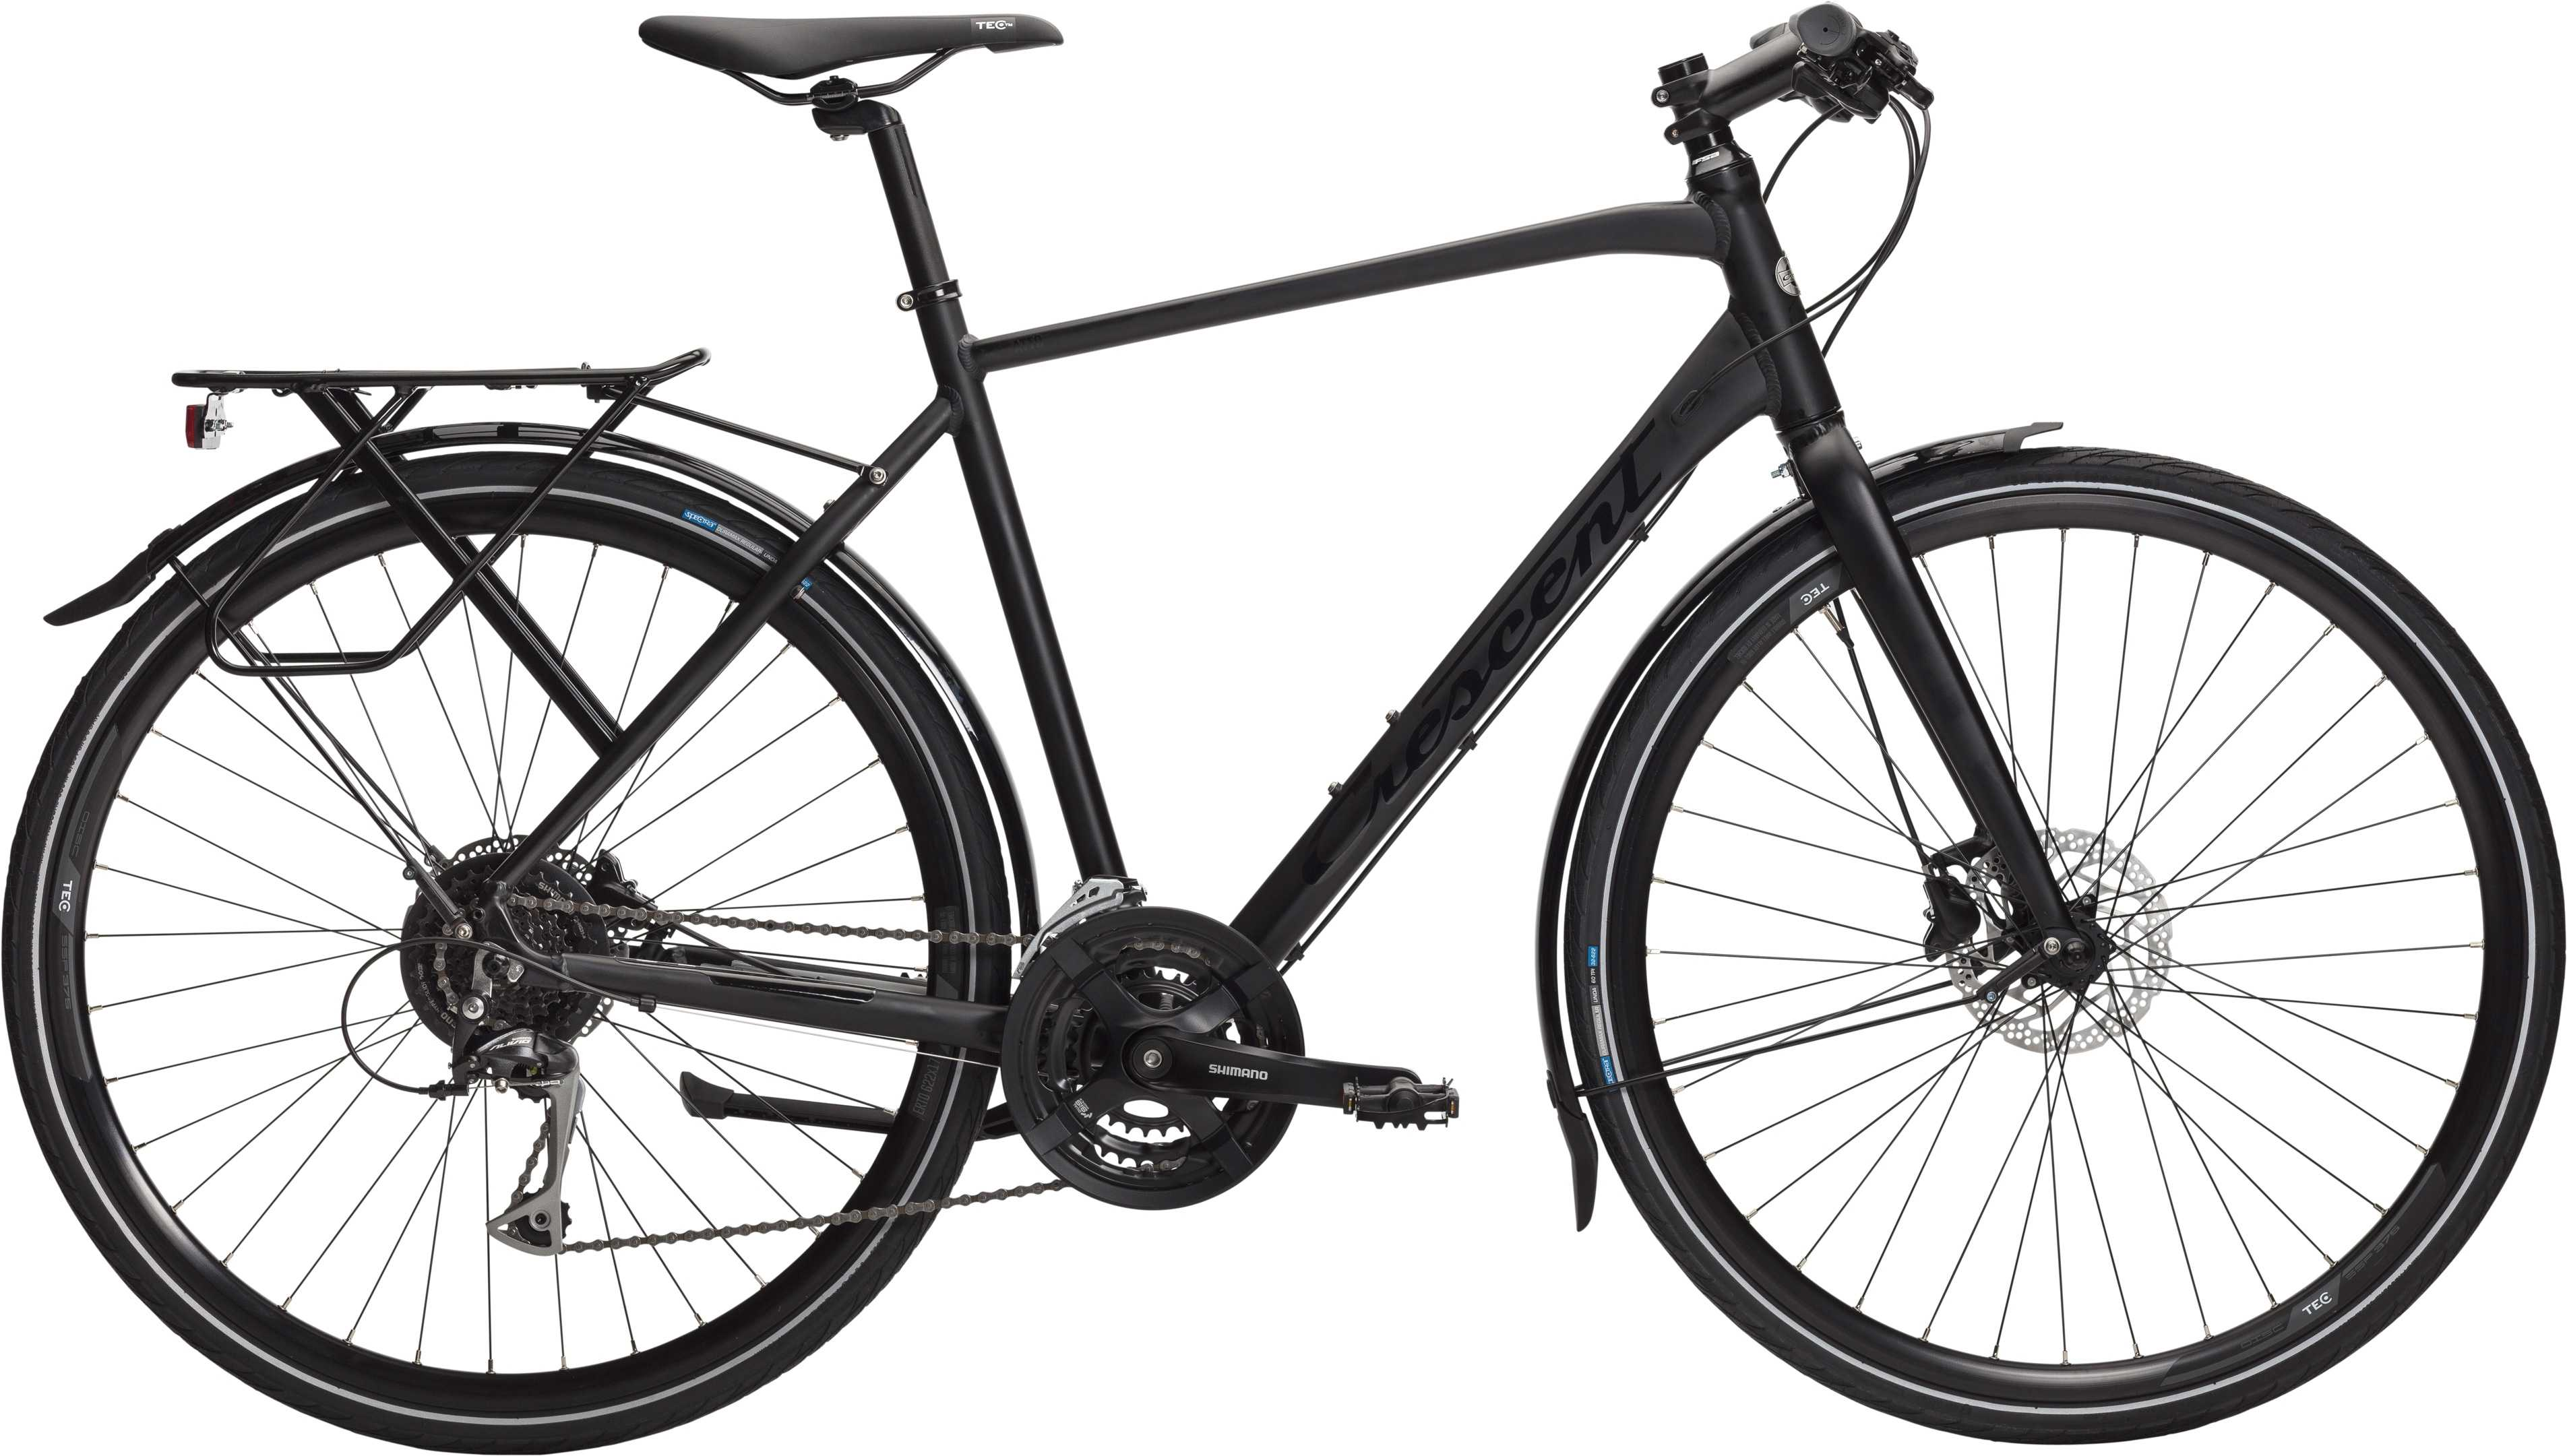 CRESCENT ATTO+ MATSORT | City-cykler